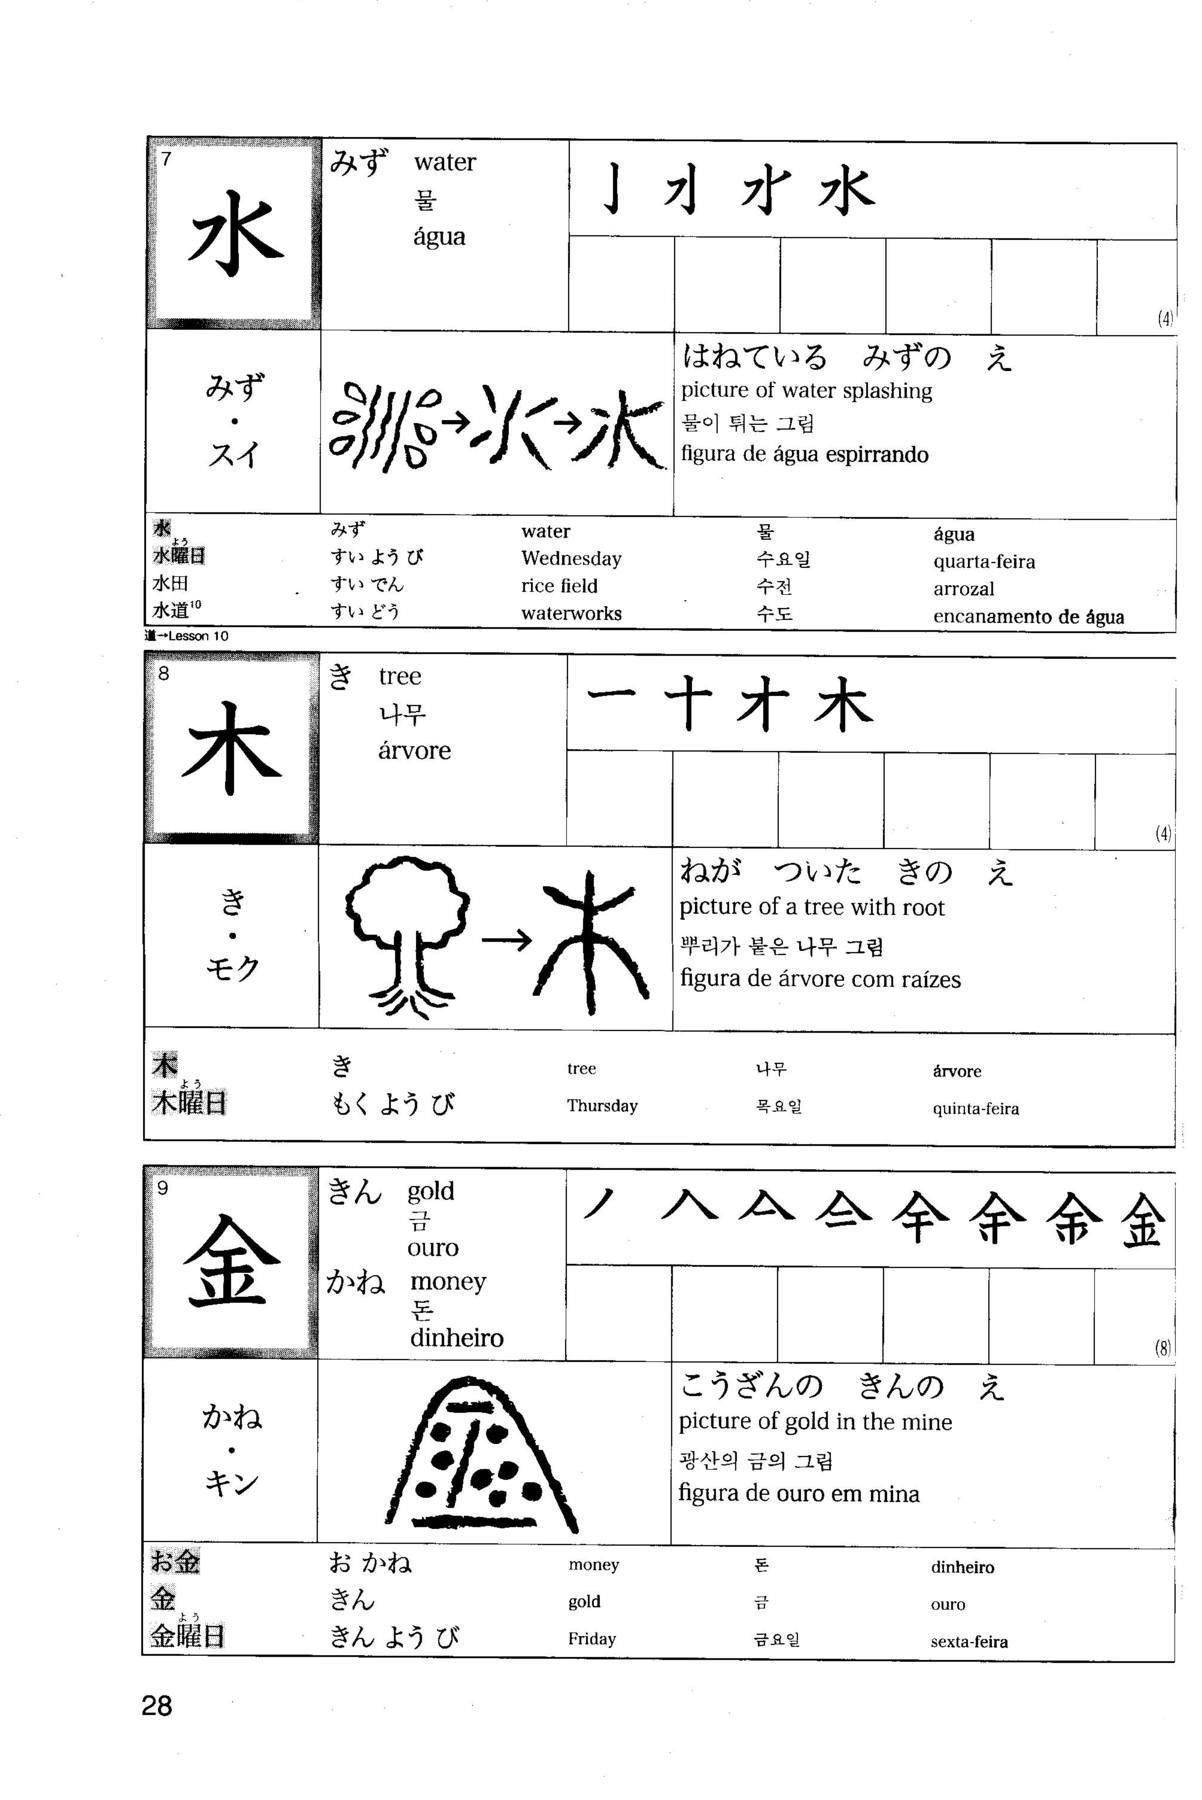 Nihongo Challenge For Jlpt N4 Amp N5 Kanji